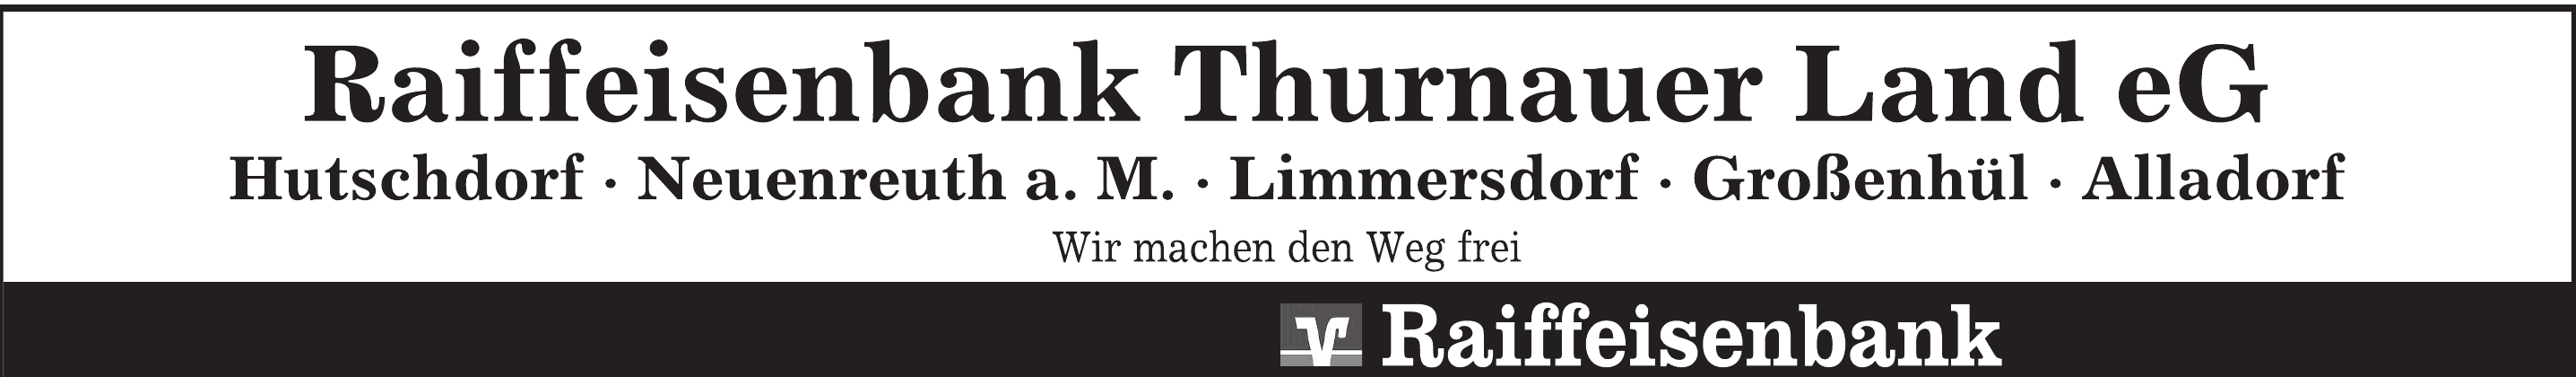 Raiffeisenbank Thurnauer Land eG